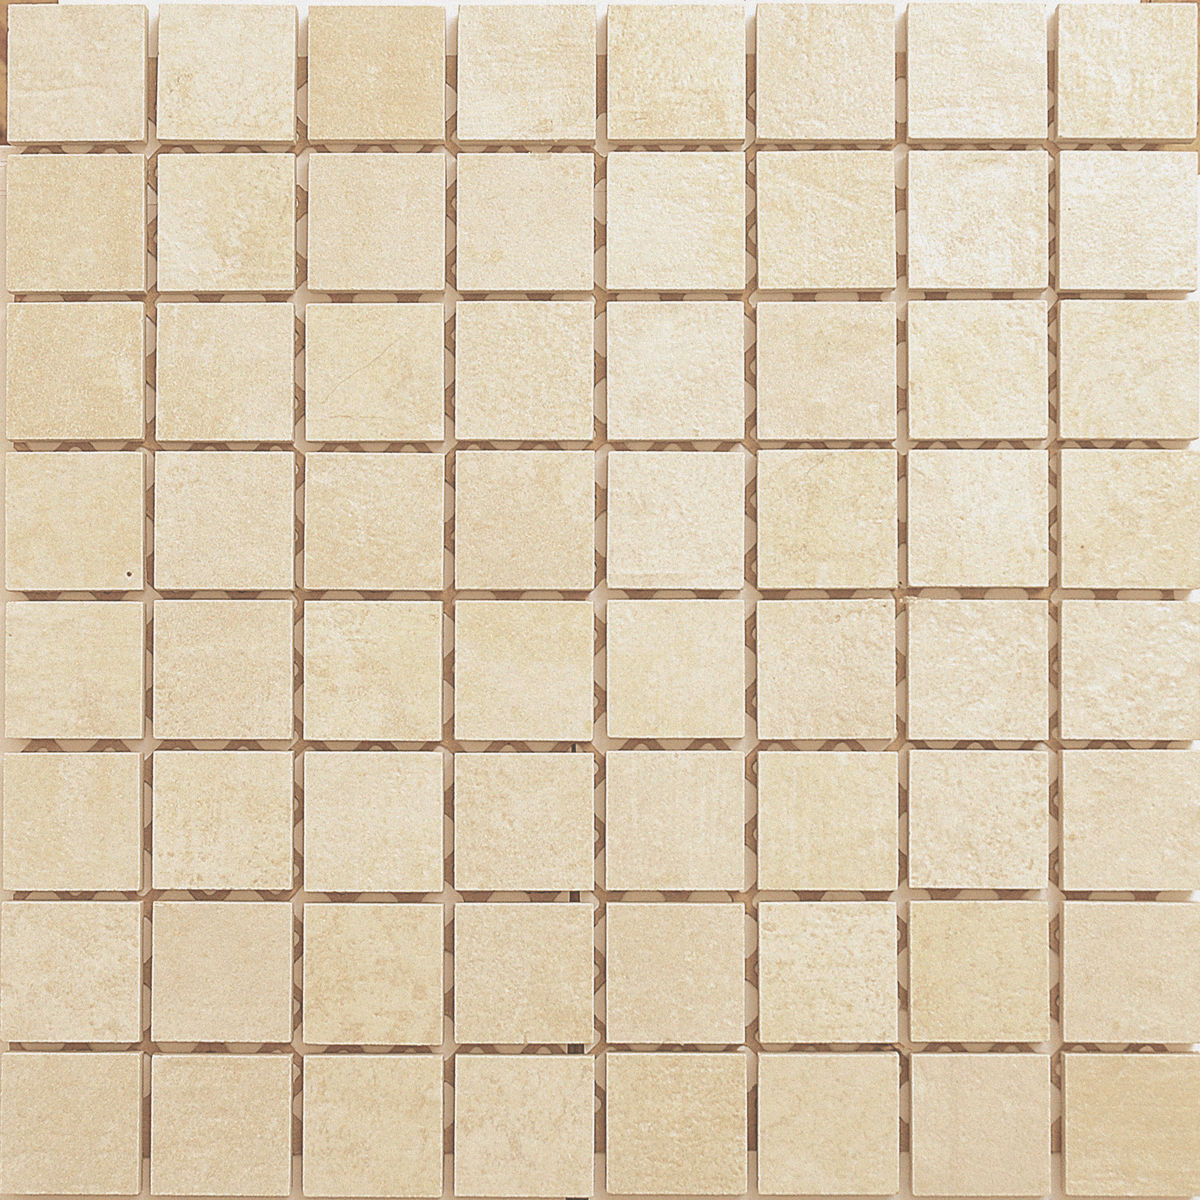 Мозаика Cotto Classico beige (mqax21) изображение 0